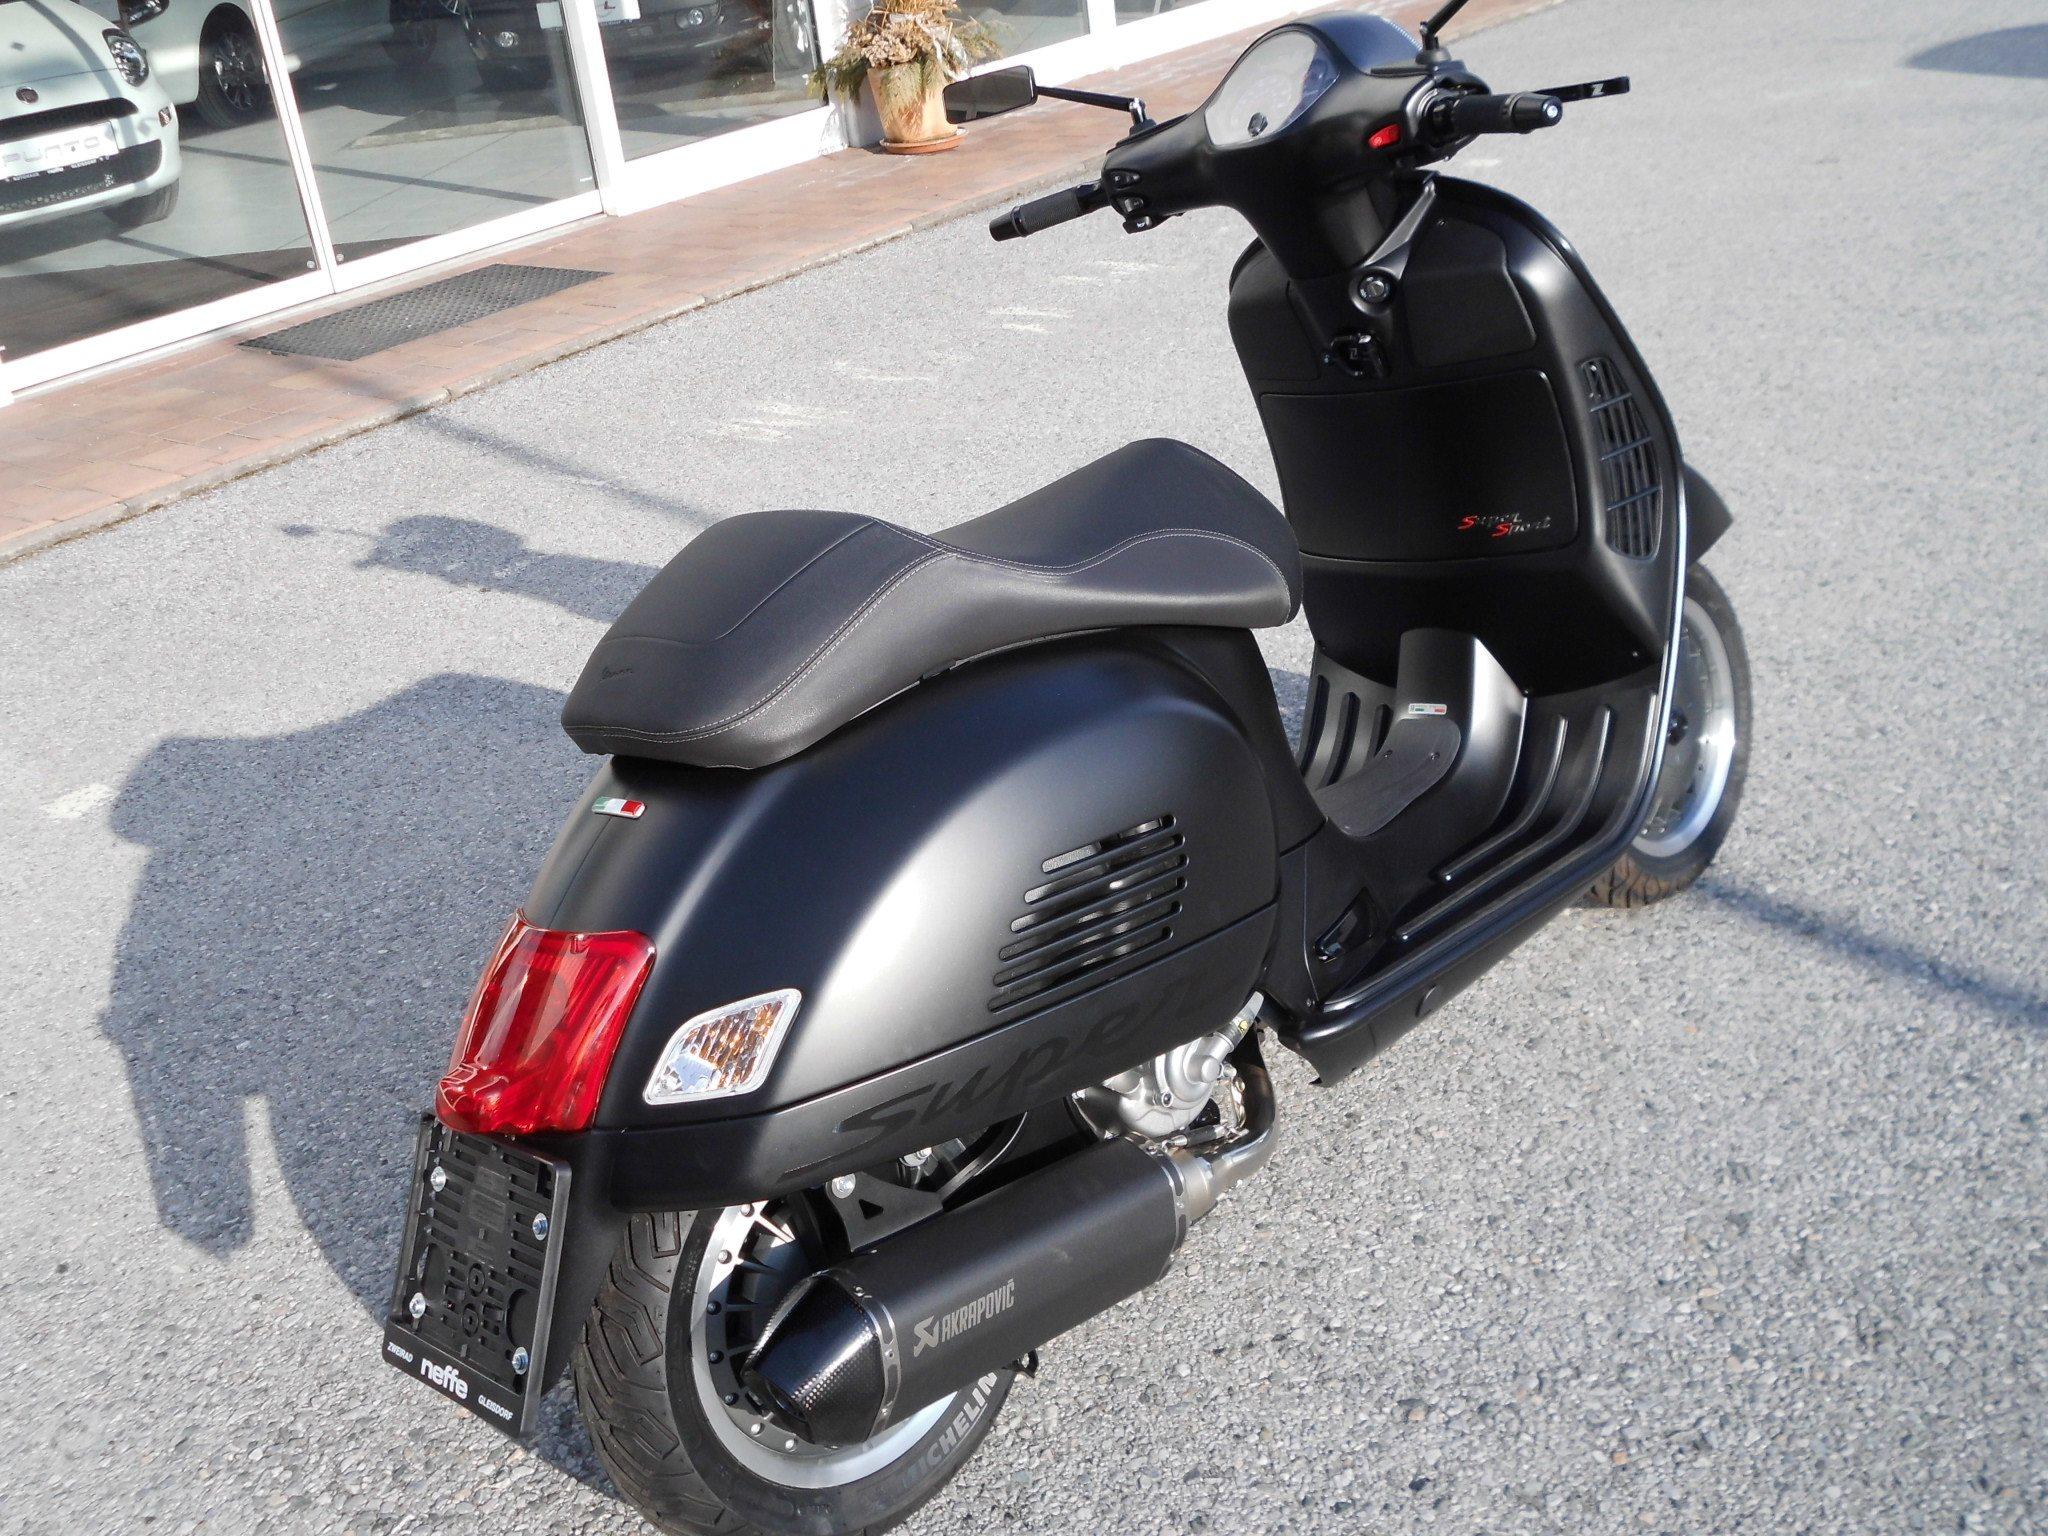 umgebautes motorrad vespa gts 300 i e super sport von. Black Bedroom Furniture Sets. Home Design Ideas